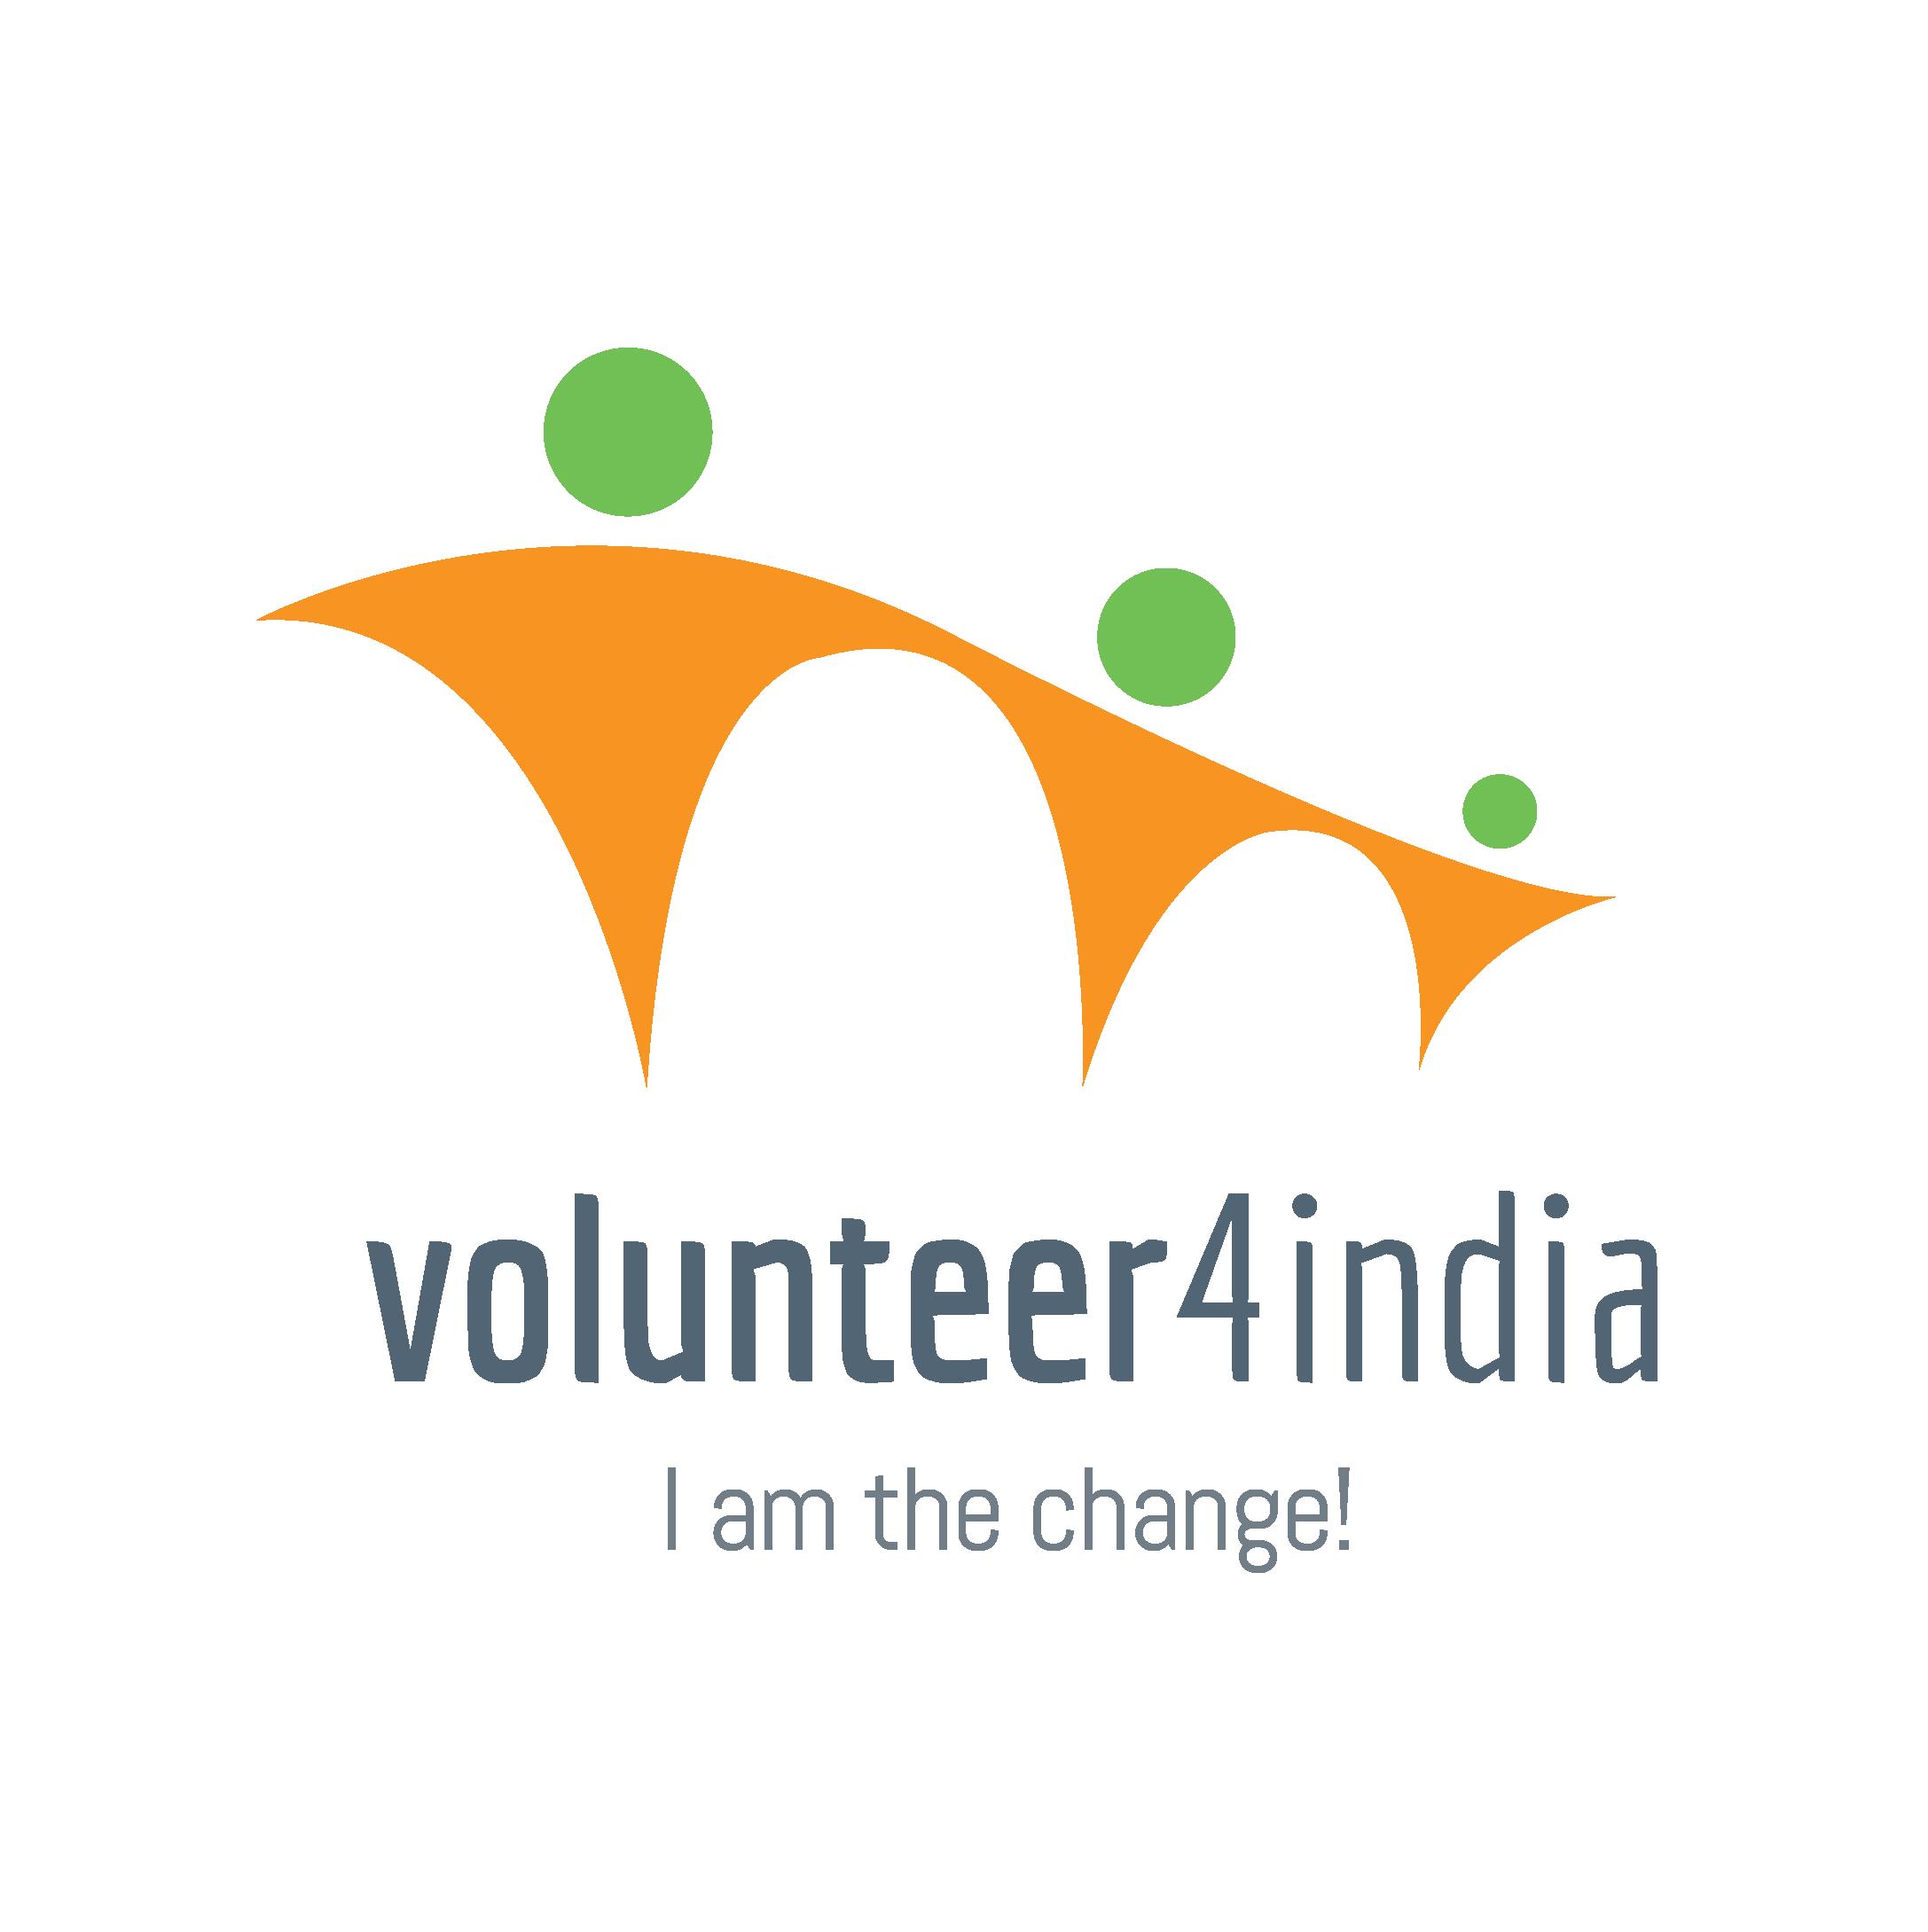 Volunteer4India